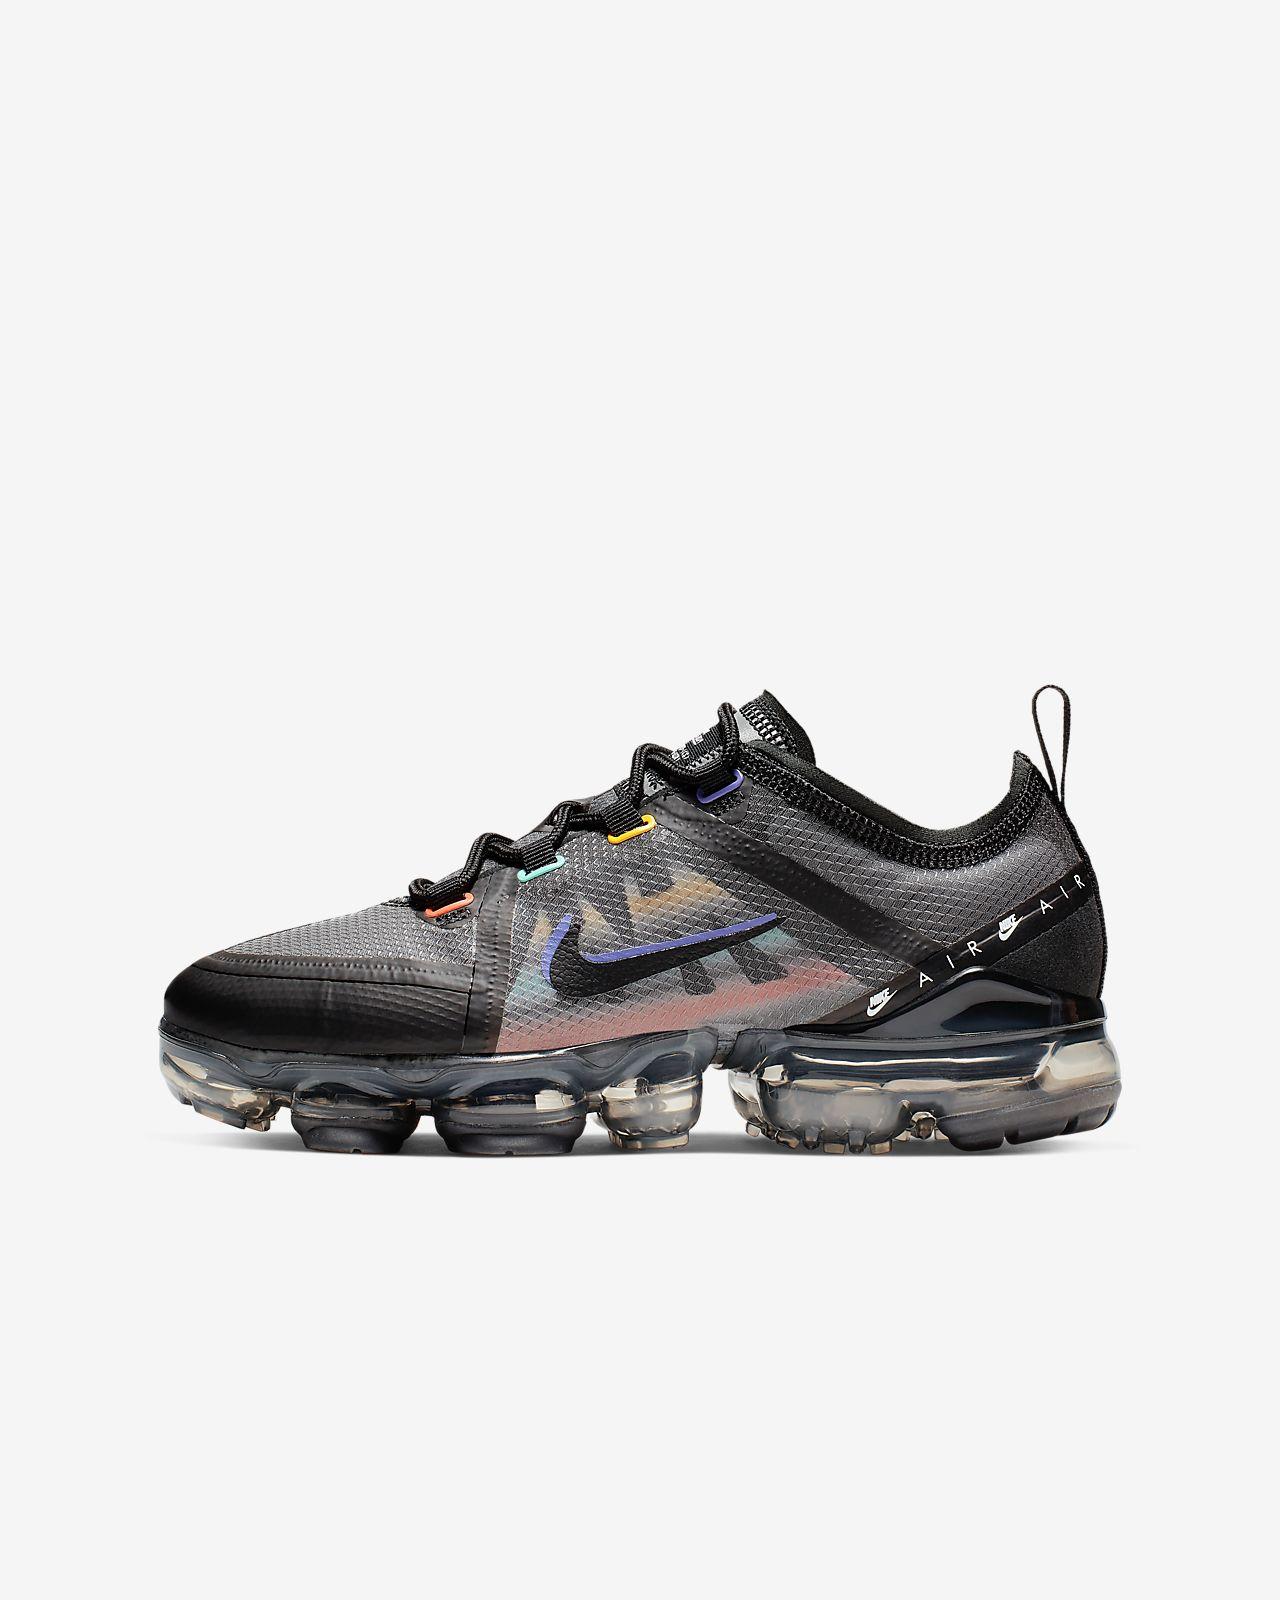 Nike Air VaporMax 2019 Game Change Schuh für ältere Kinder